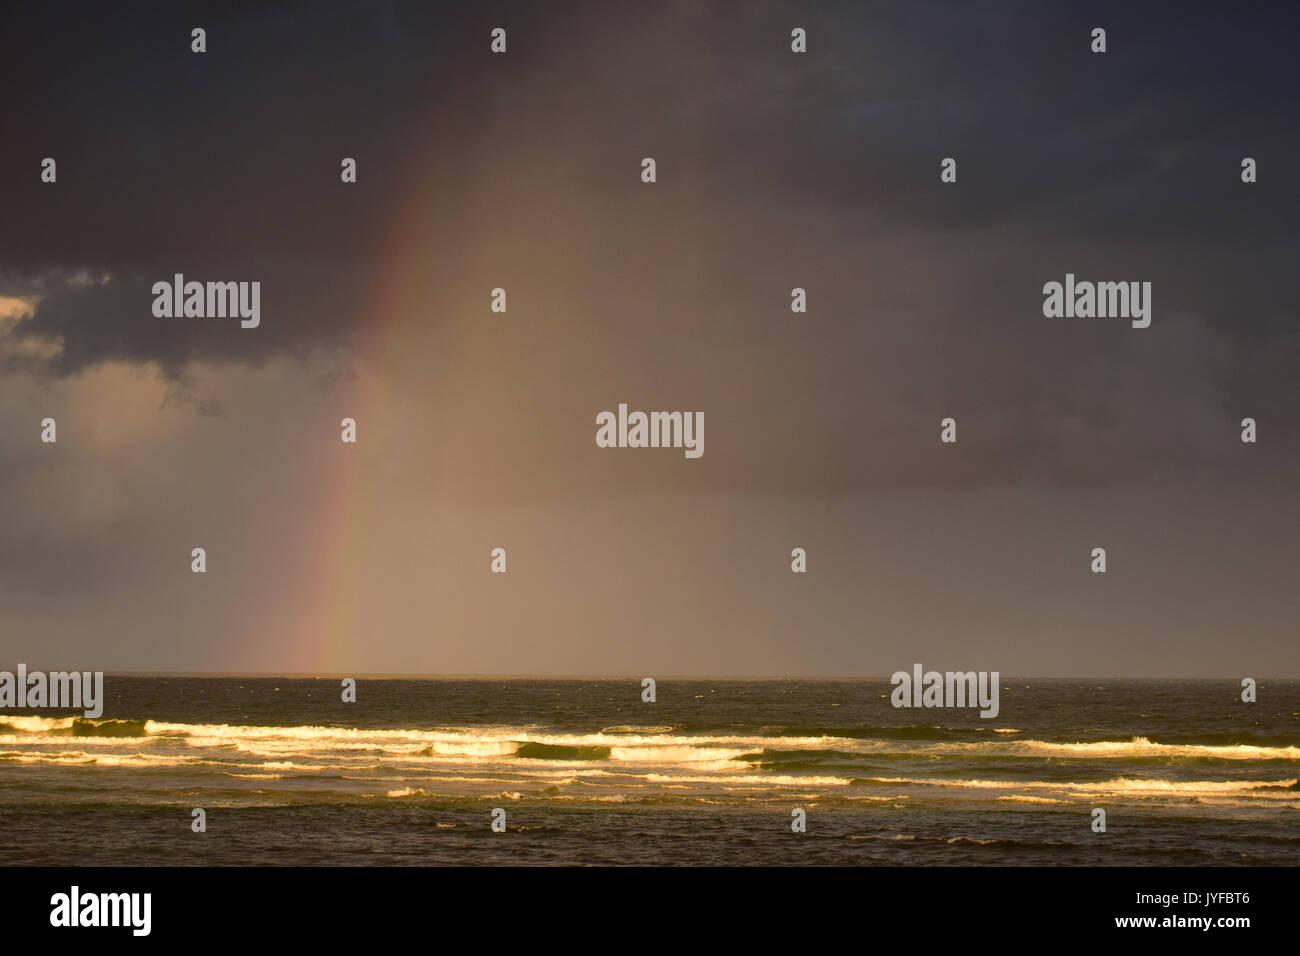 Rainbow over the Sea, Seven Mile Beach, New South Wales, Australia - Stock Image